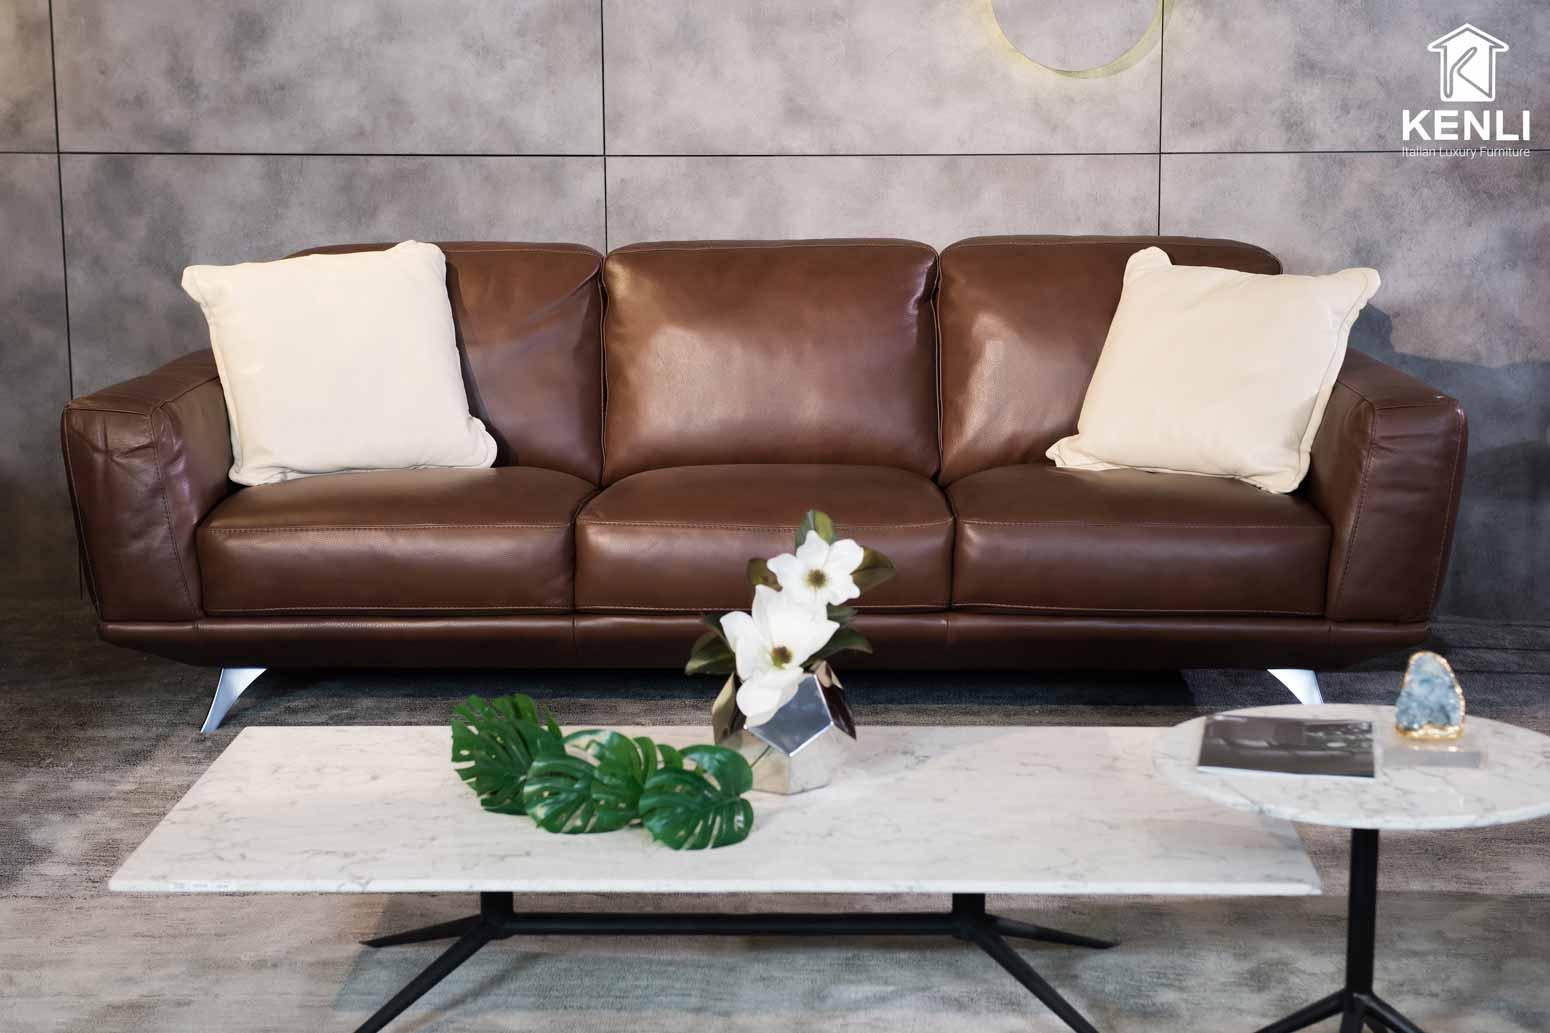 Sofa da thật F019 full bộ8